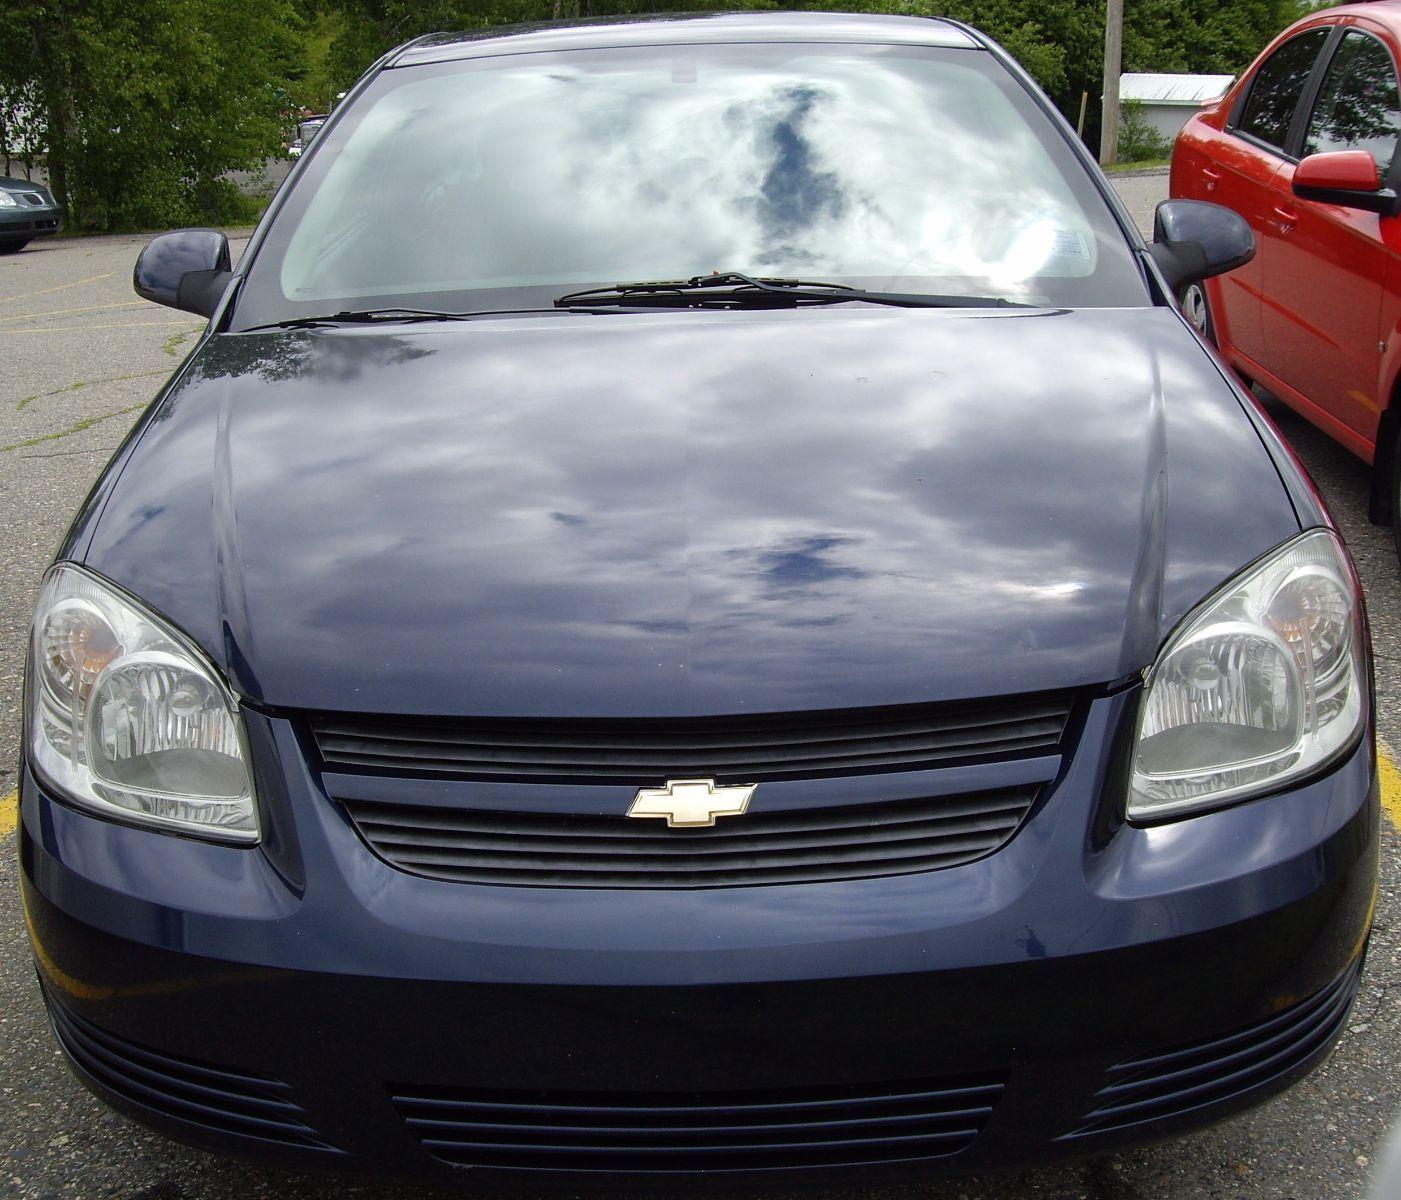 Chevrolet Used Inventory: Used 2008 Chevrolet Cobalt COBALT LT In Kentville